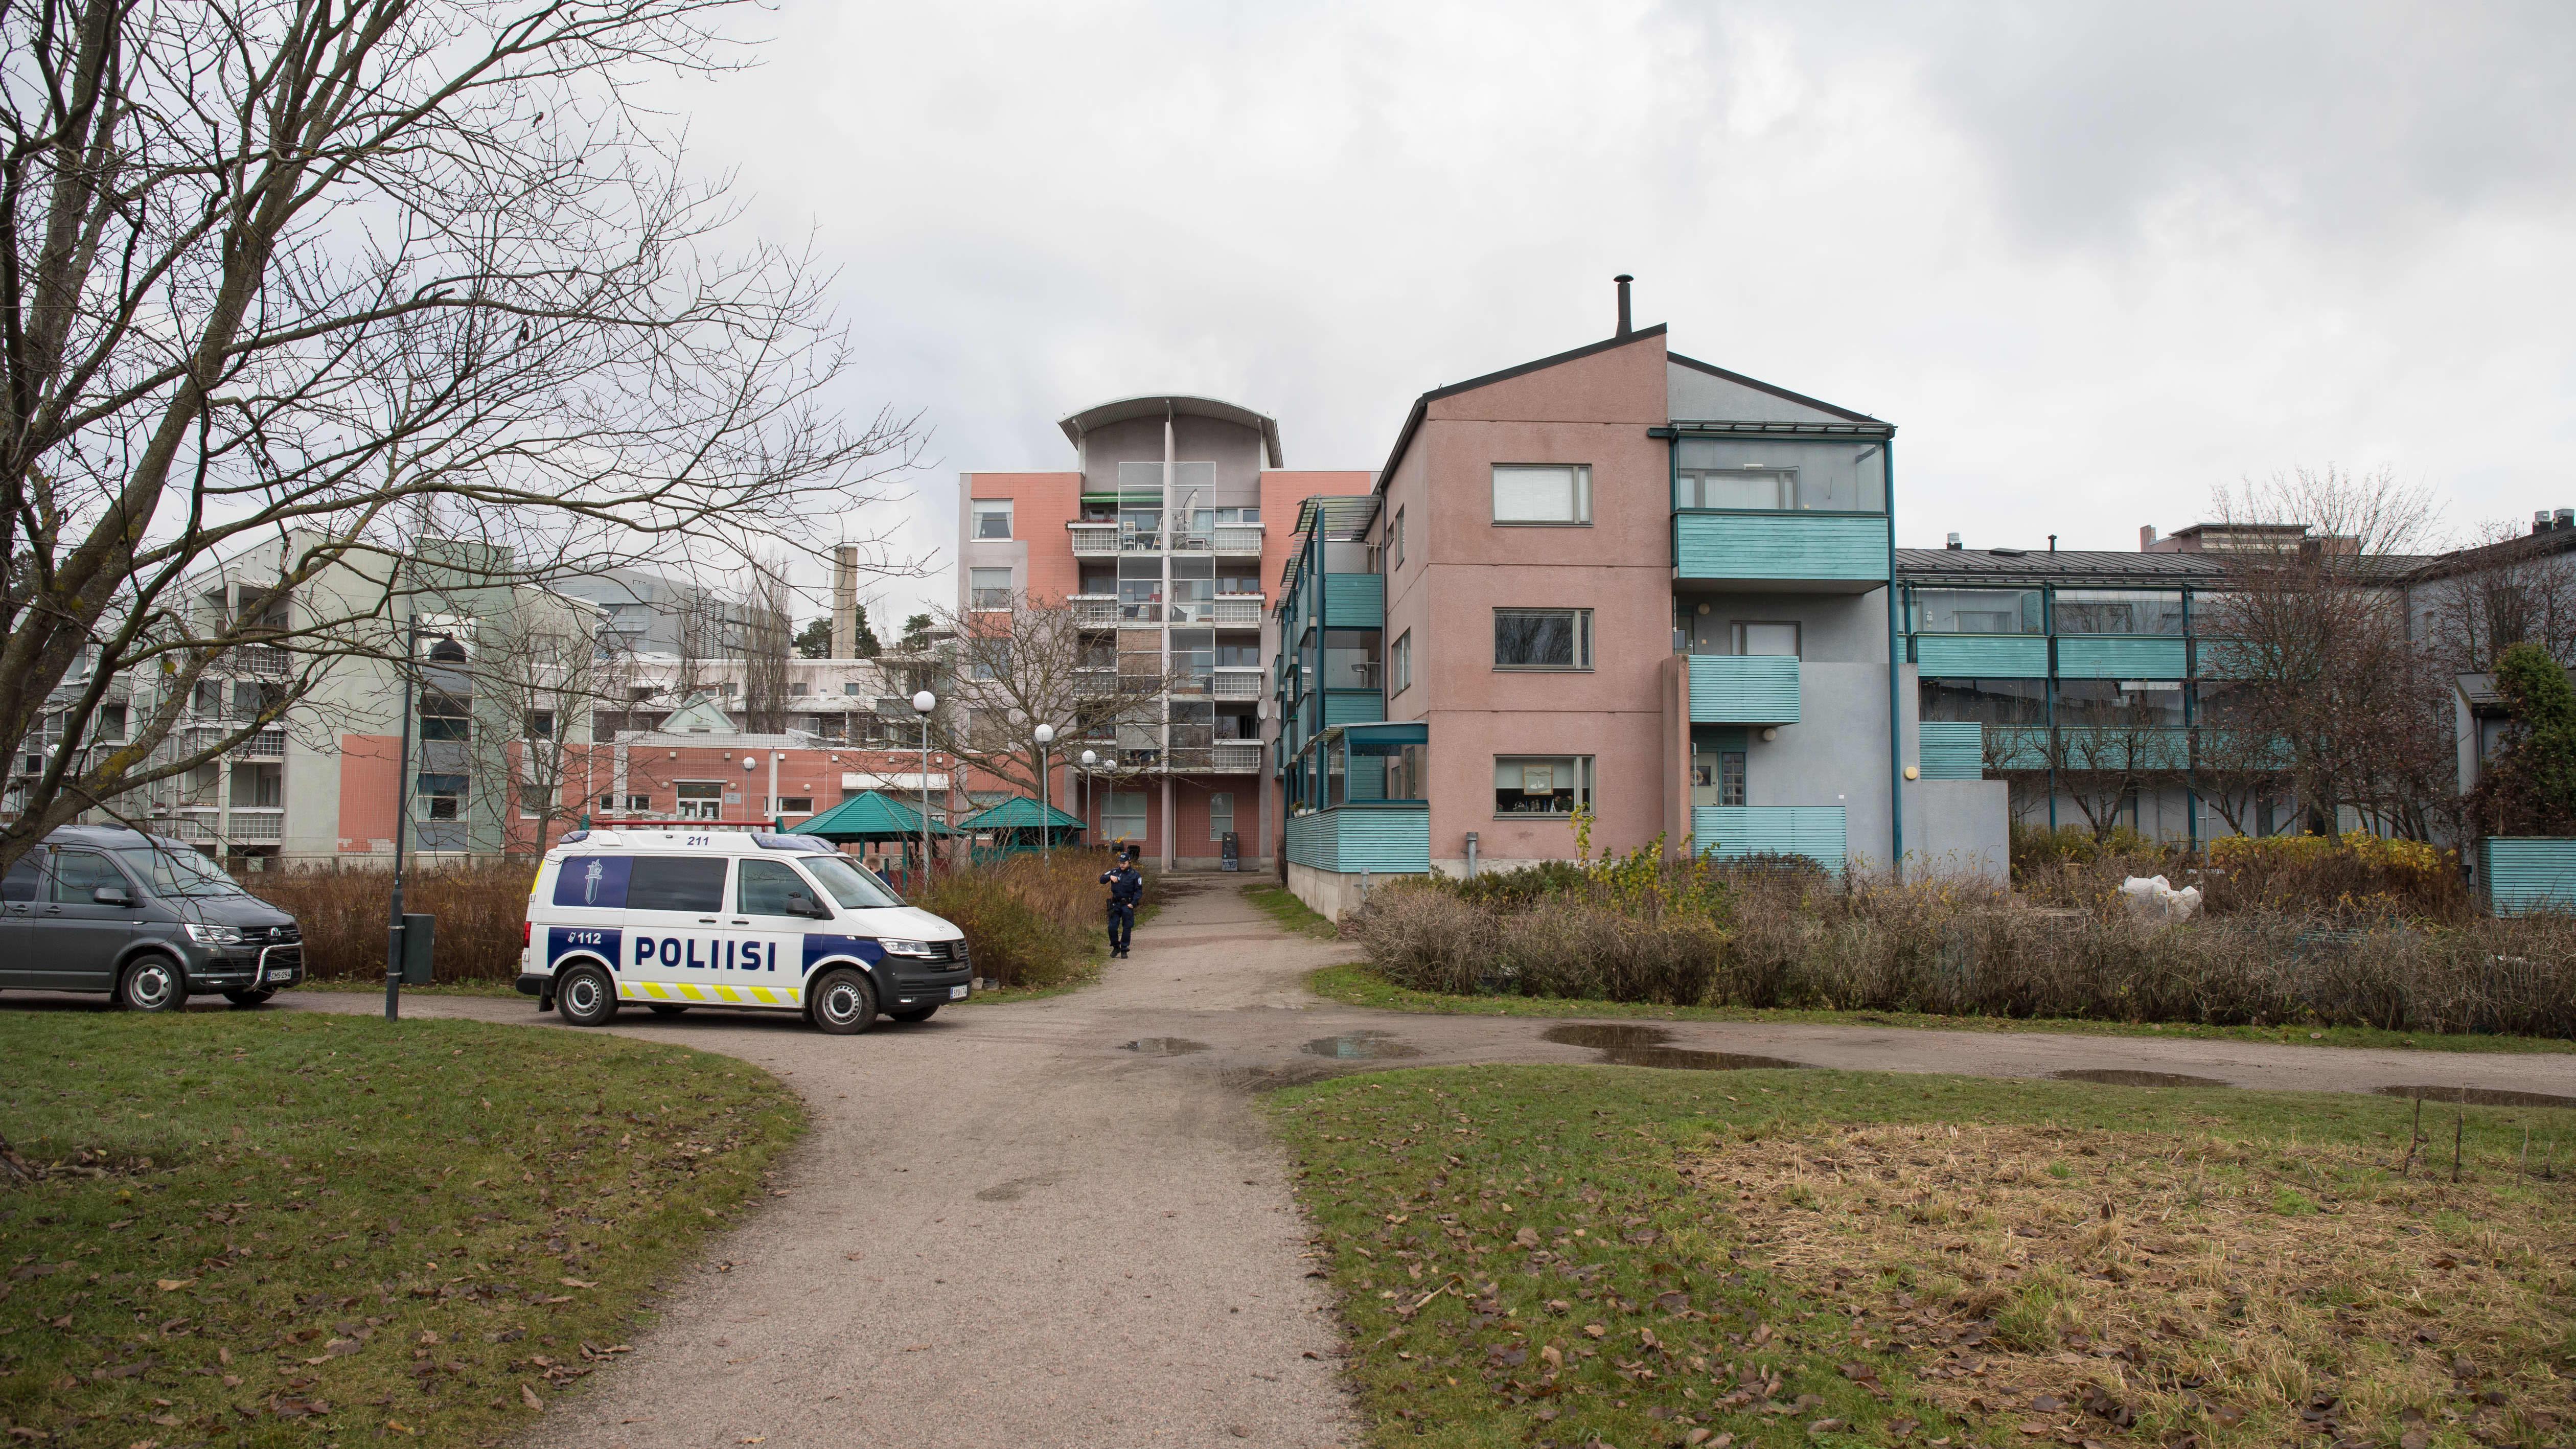 Poliiseja Pikku Huopalahdessa.